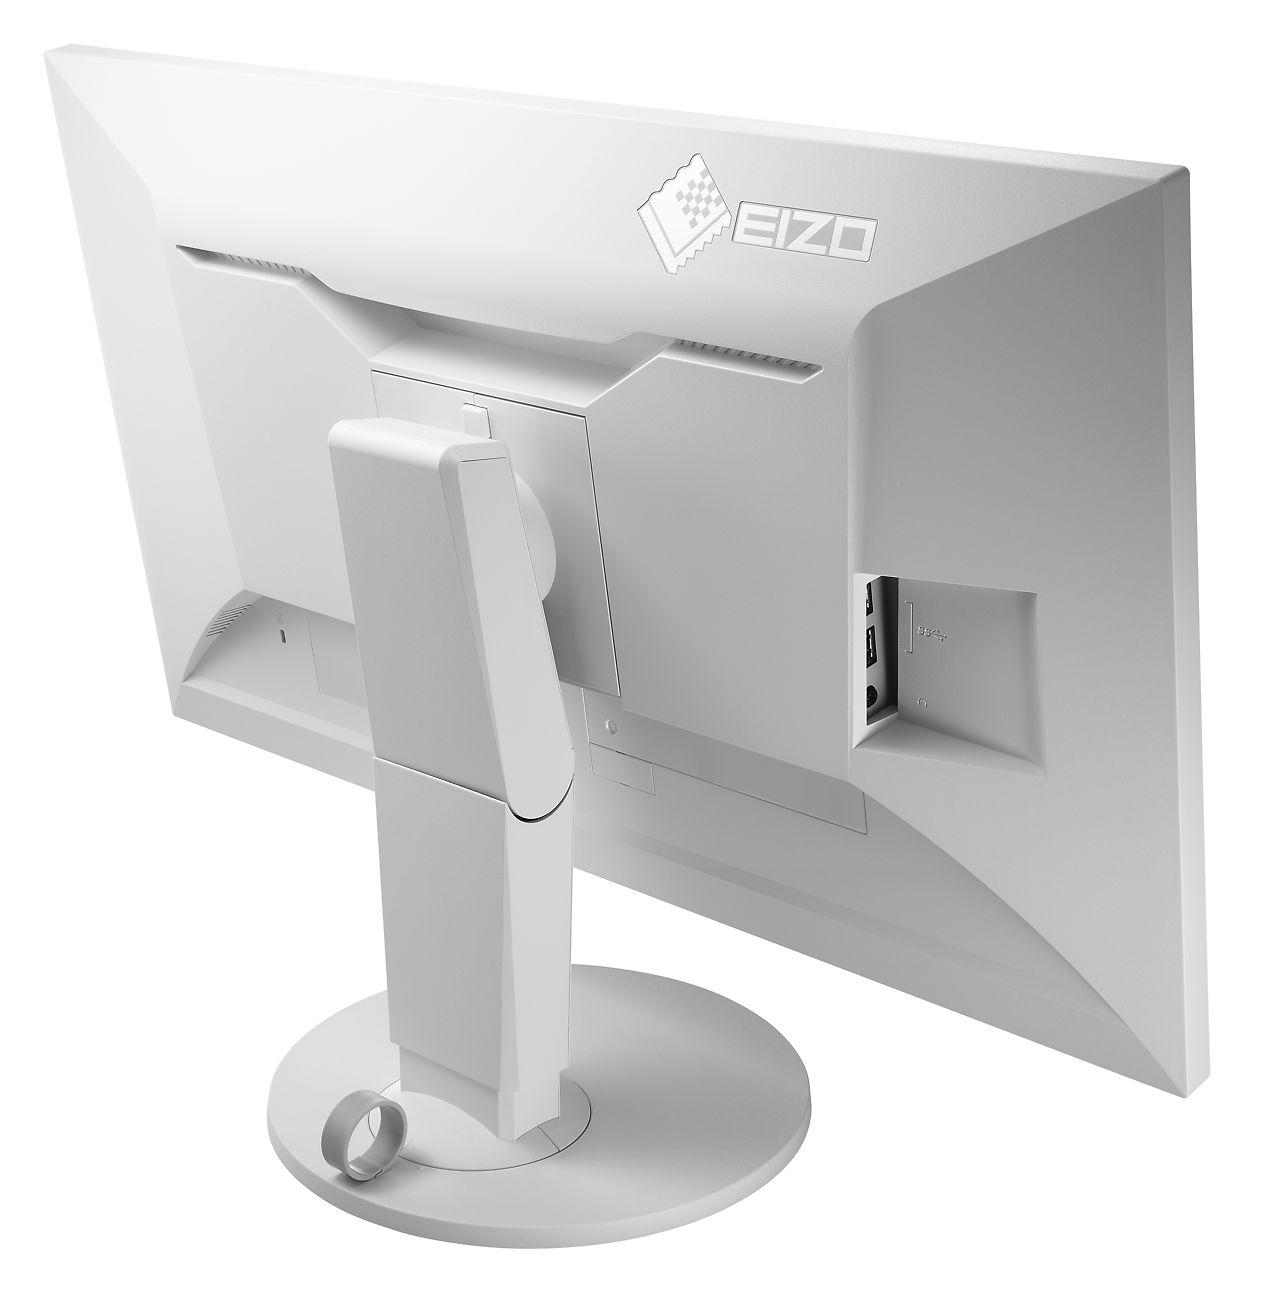 "Eizo Flexscan EV2780 27"" Monitor Image"